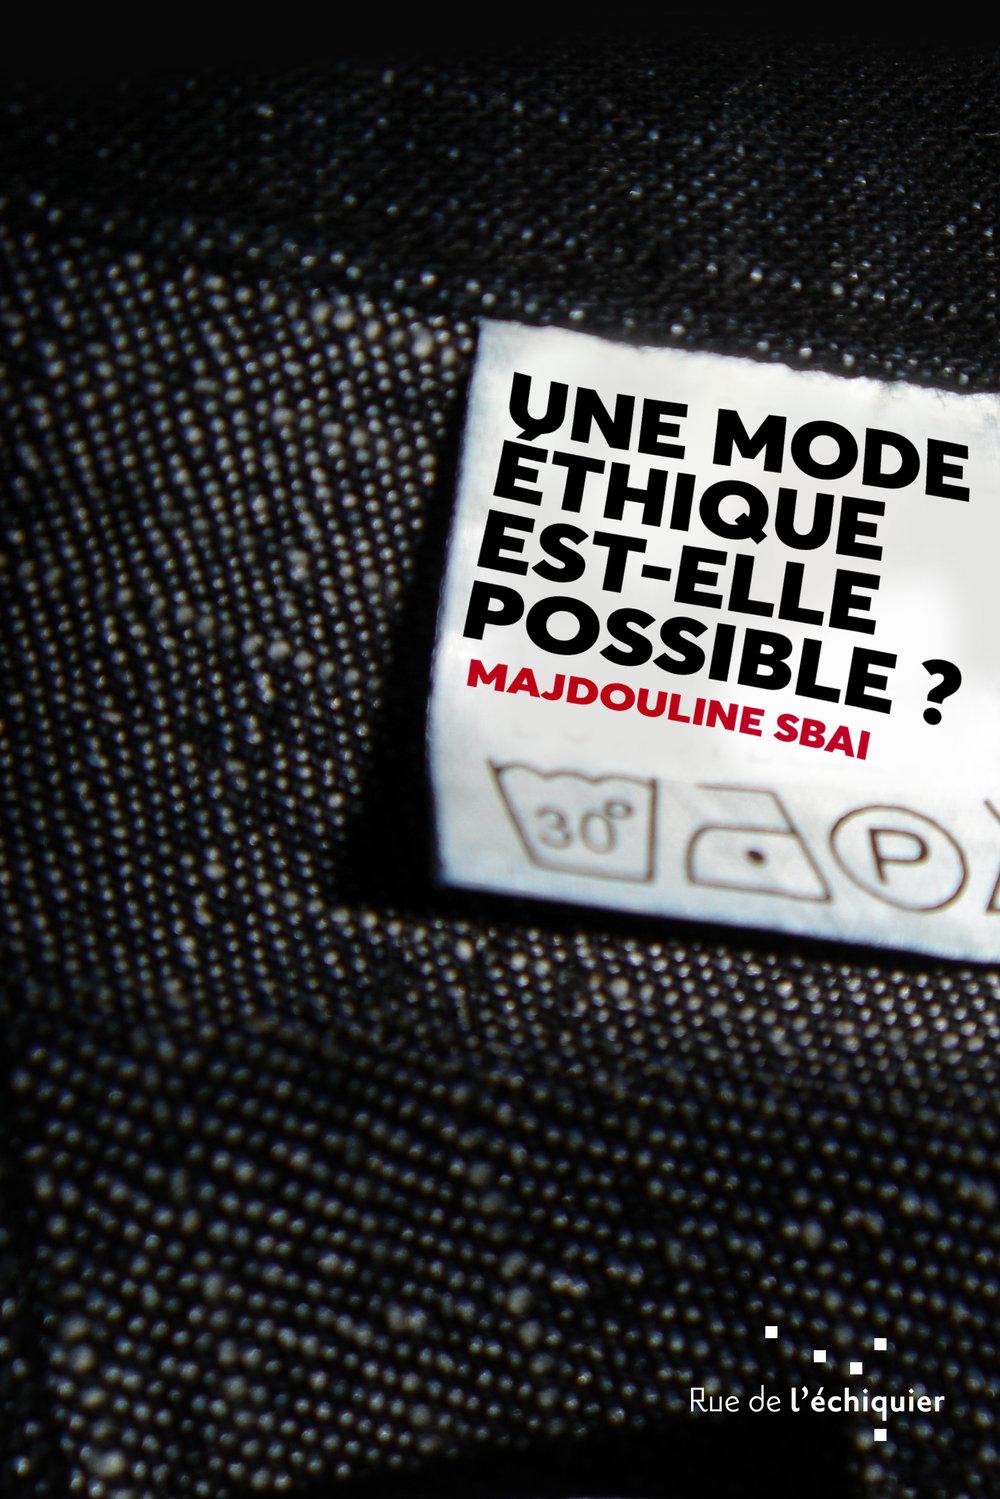 Madjouline Sbai's book cover